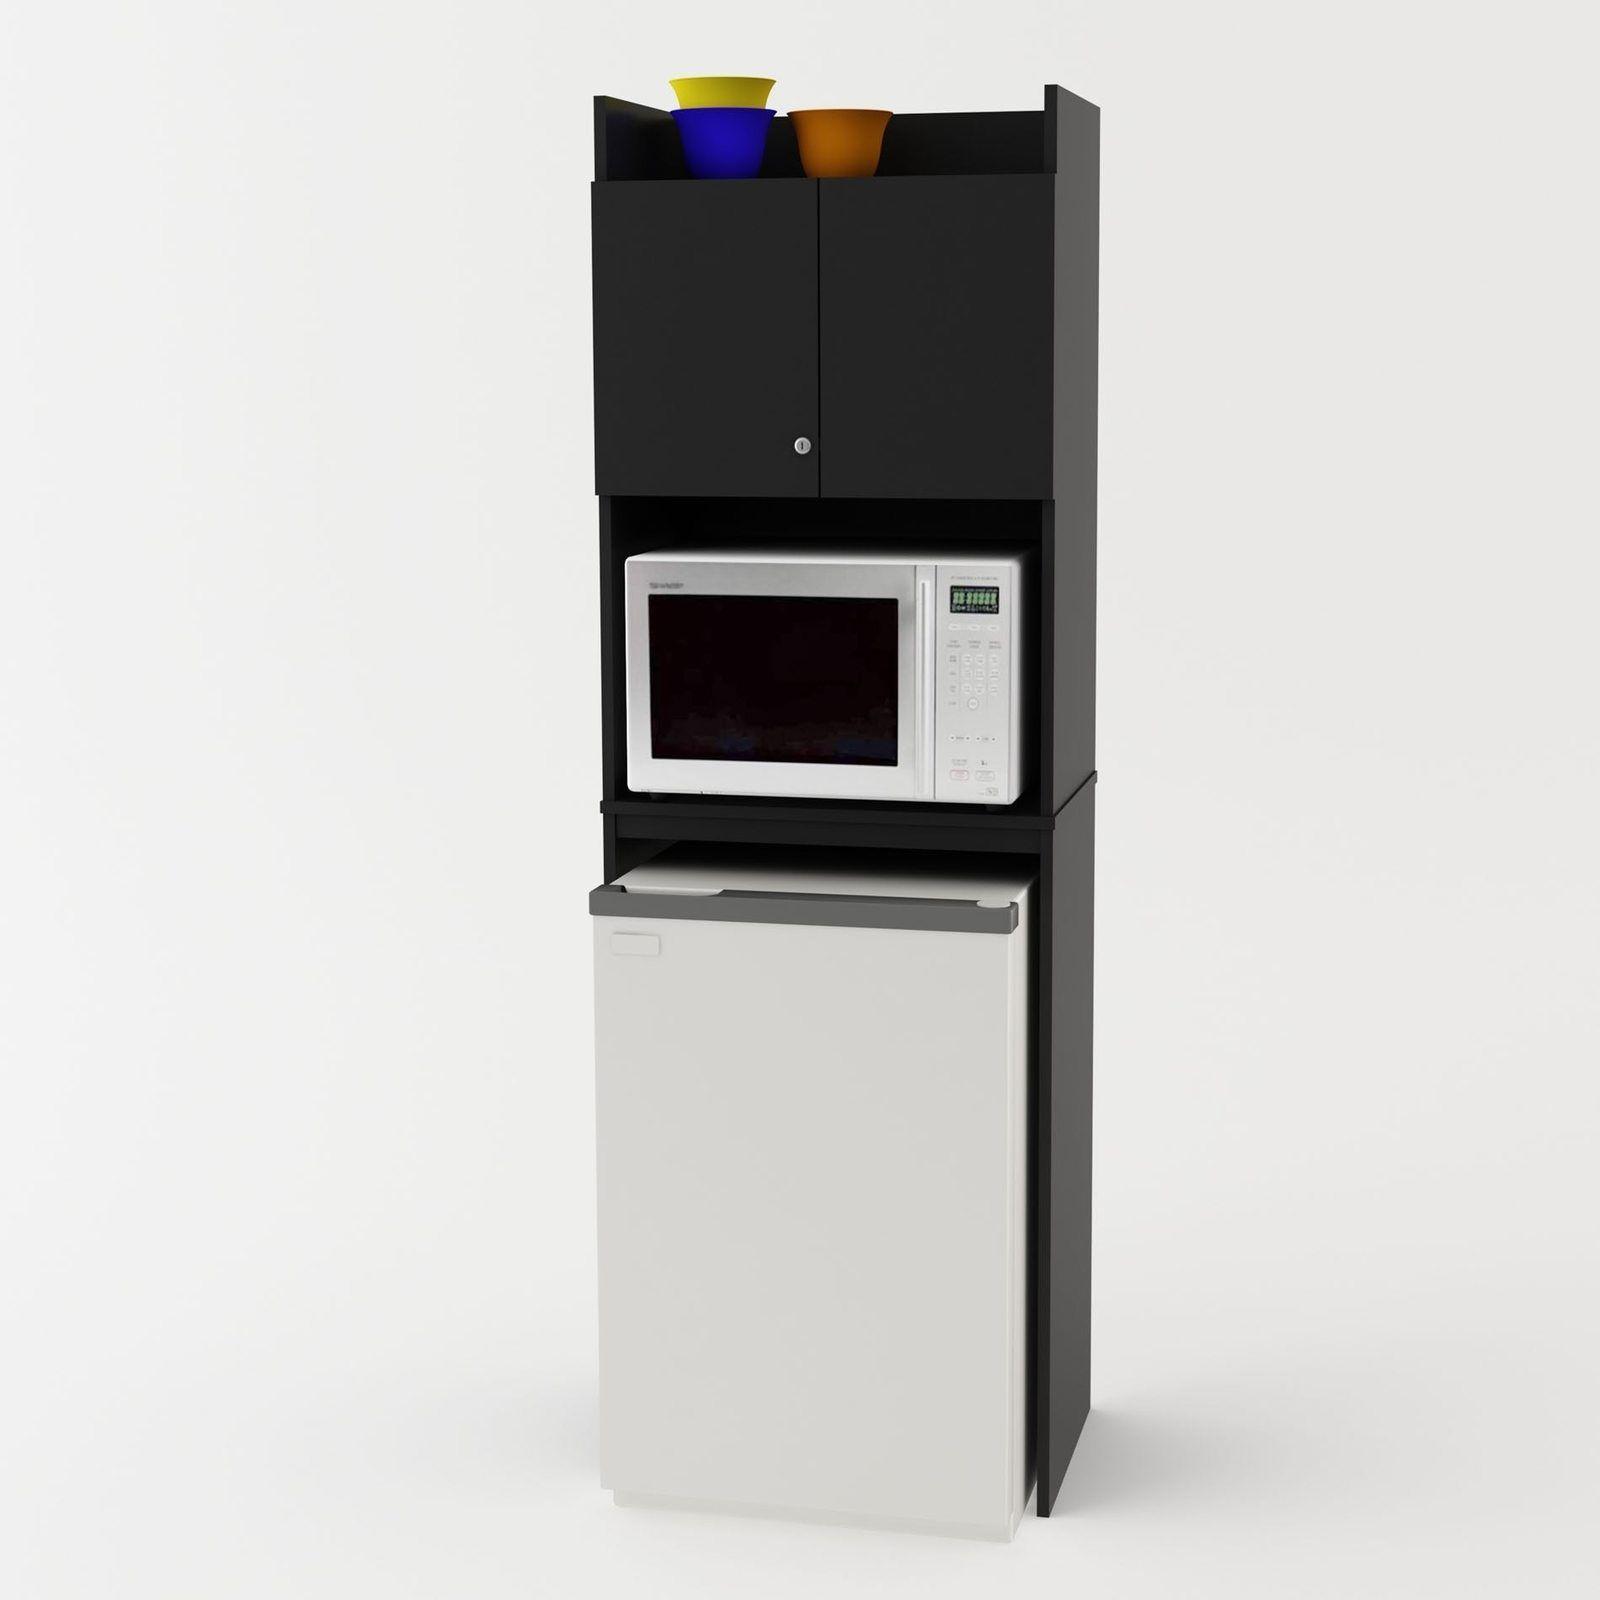 Tall Kitchen Storage Cabinet Fridge Microwave Dorm Studio